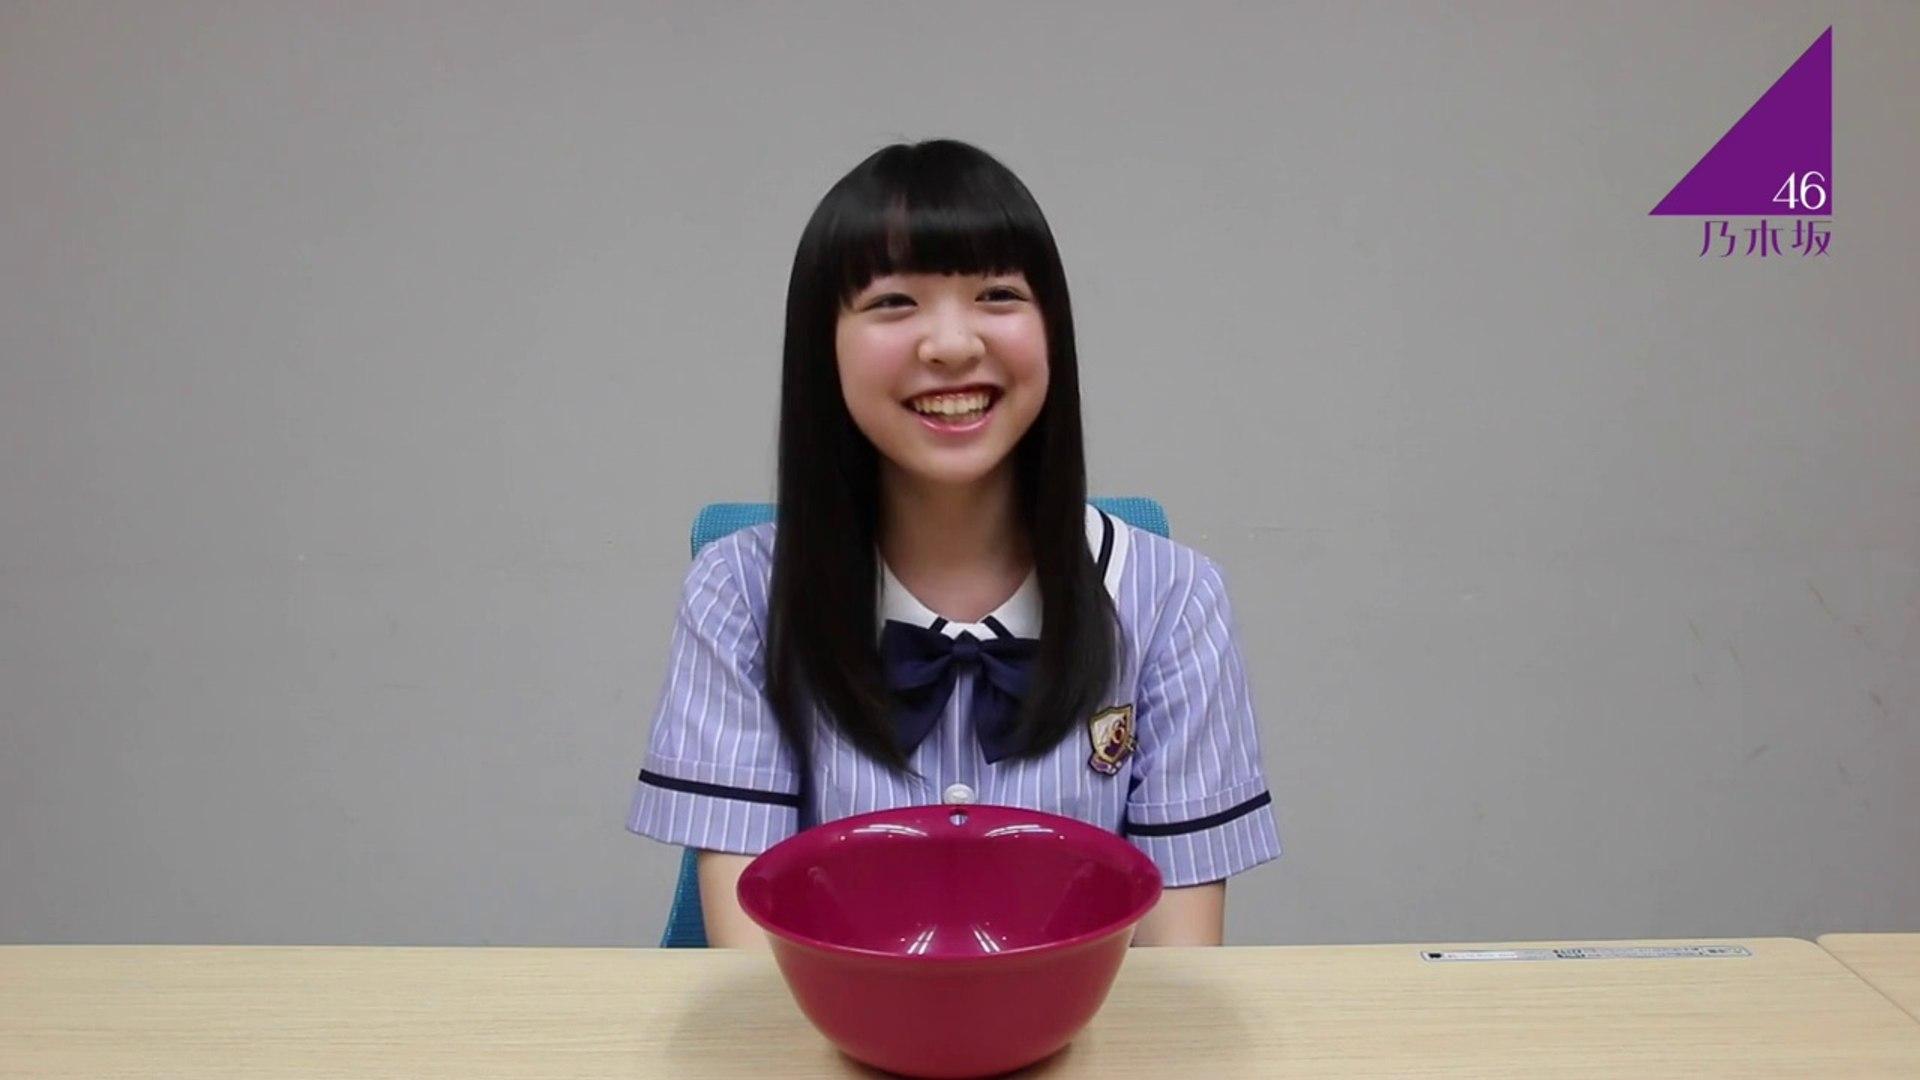 Nogizaka46 - 3rd Anniversary Message - Watanabe Miria